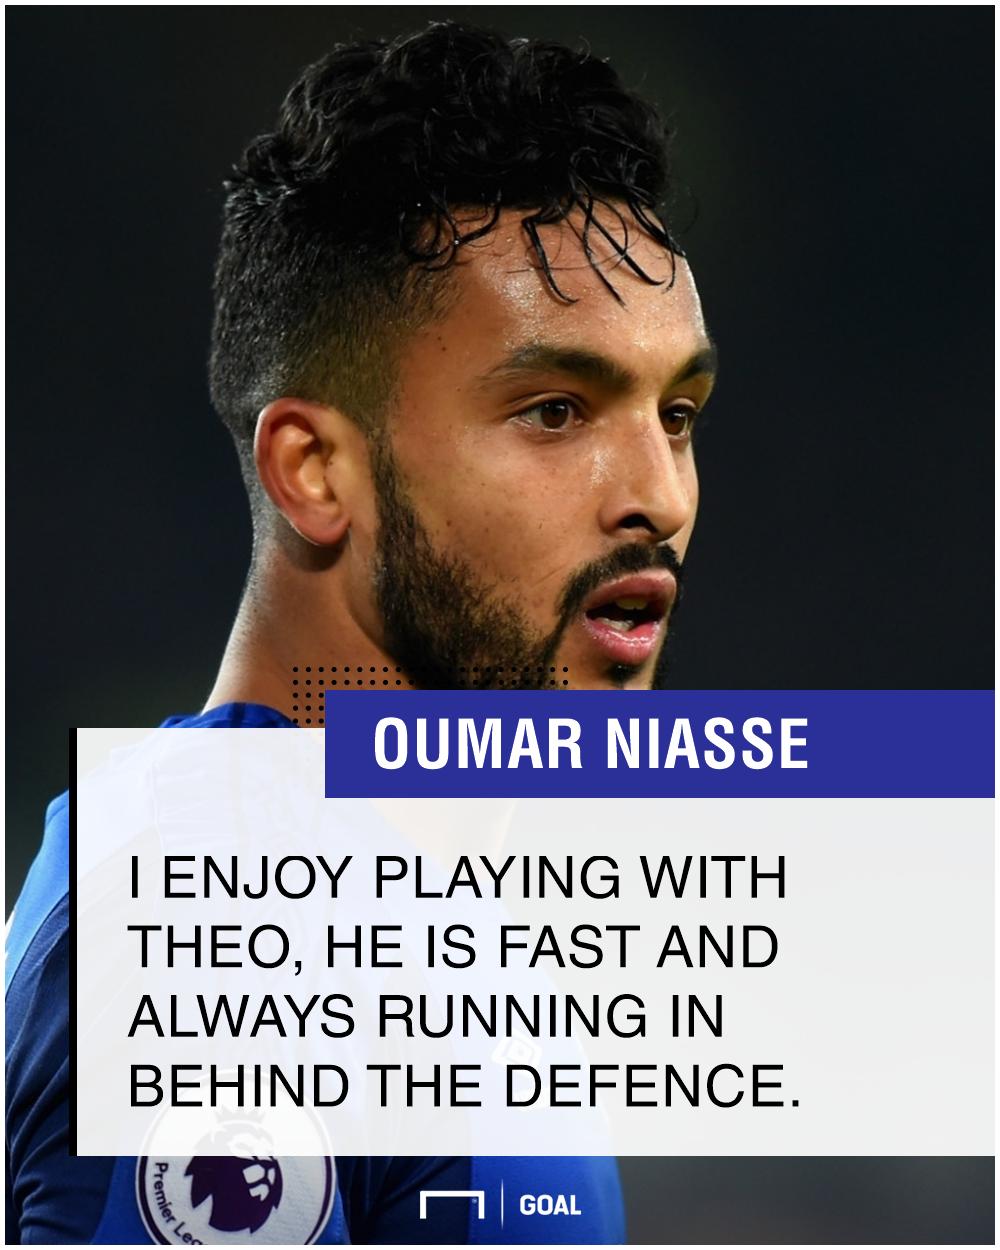 Oumar Niasse ps